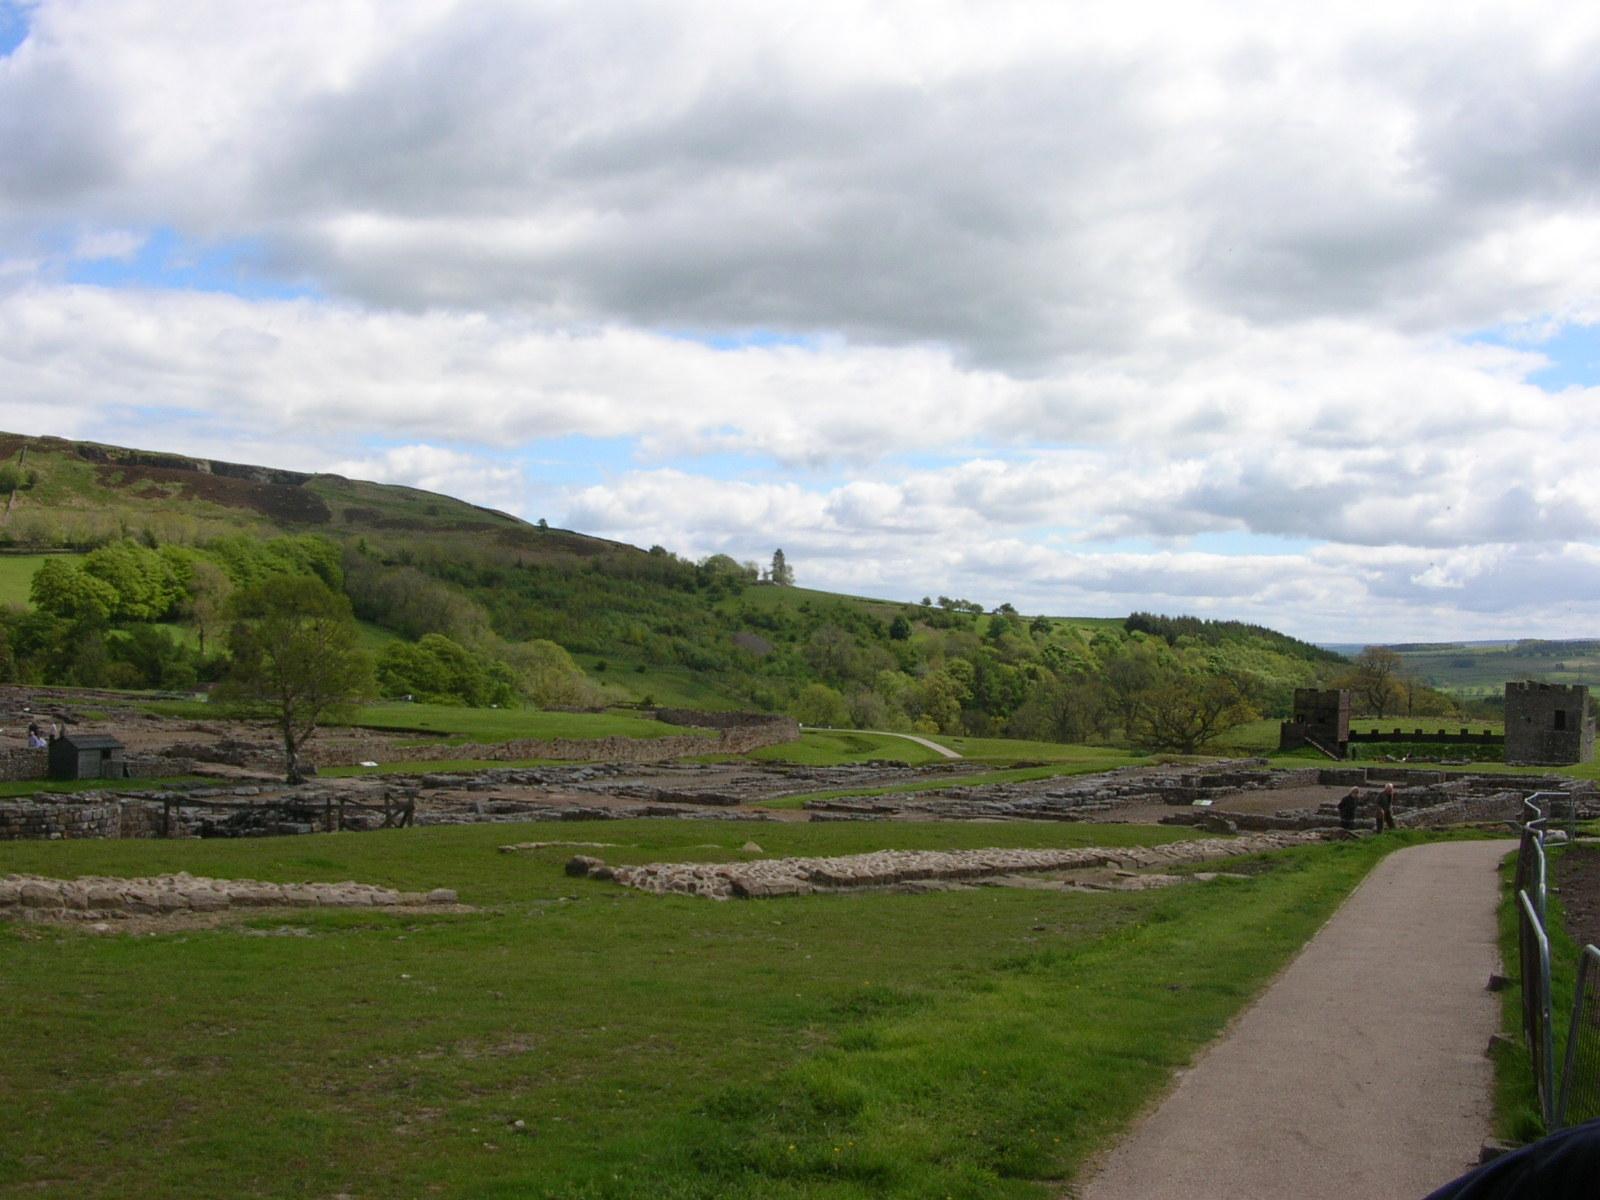 Vindolanda_trip_June_2103_006.jpg